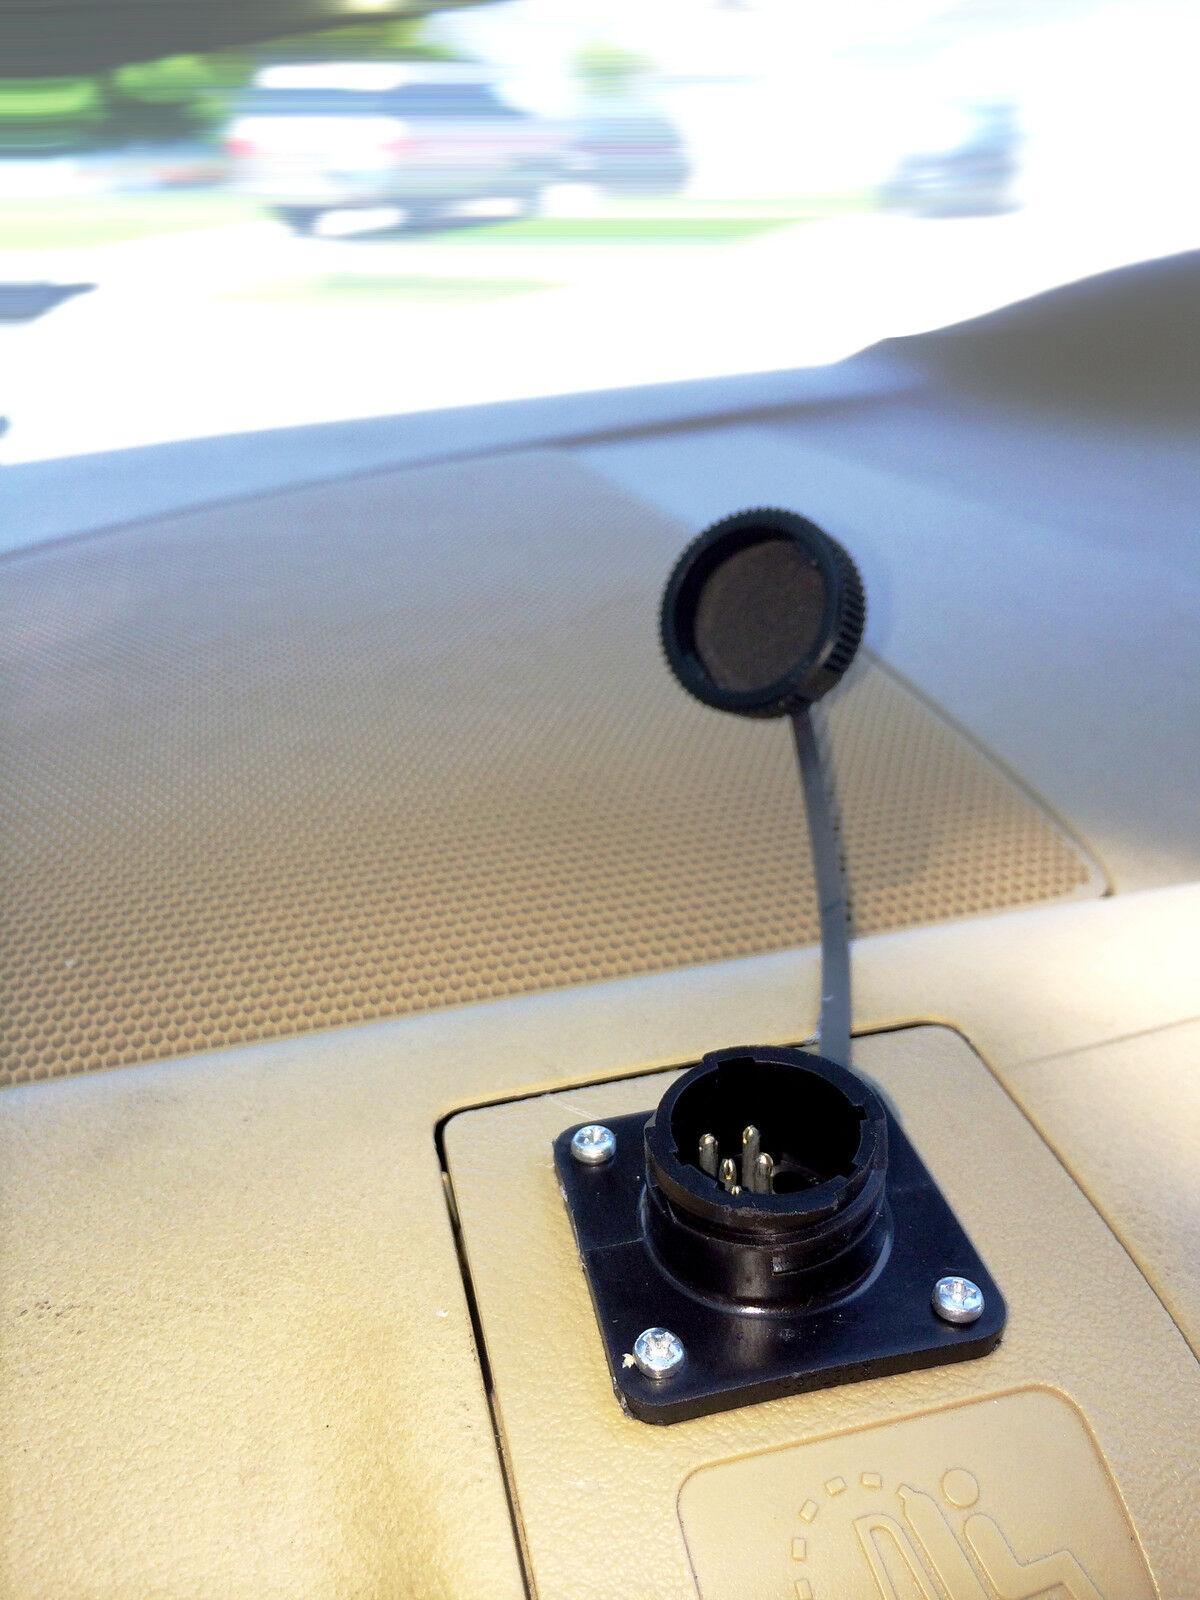 2006 2011 Honda Civic Hybrid Ima Battery Grid Charger W